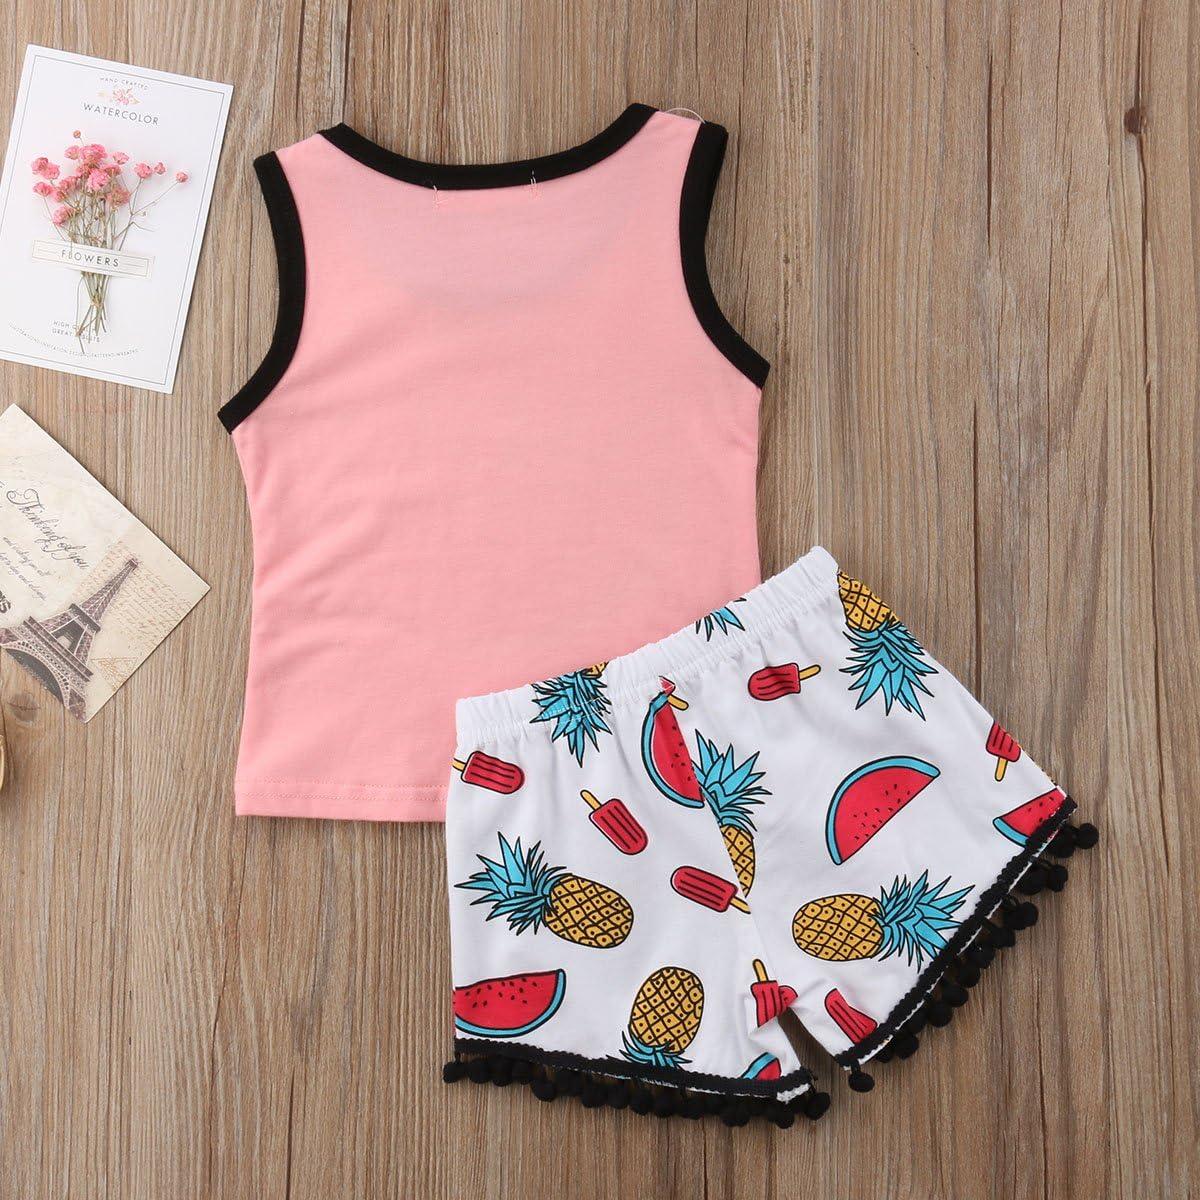 YAZAD Toddler Baby Kid Girls Watermelon Pattern Tops T-Shirt Sleeveless Cute Shorts Tassel Pants Summer Clothes